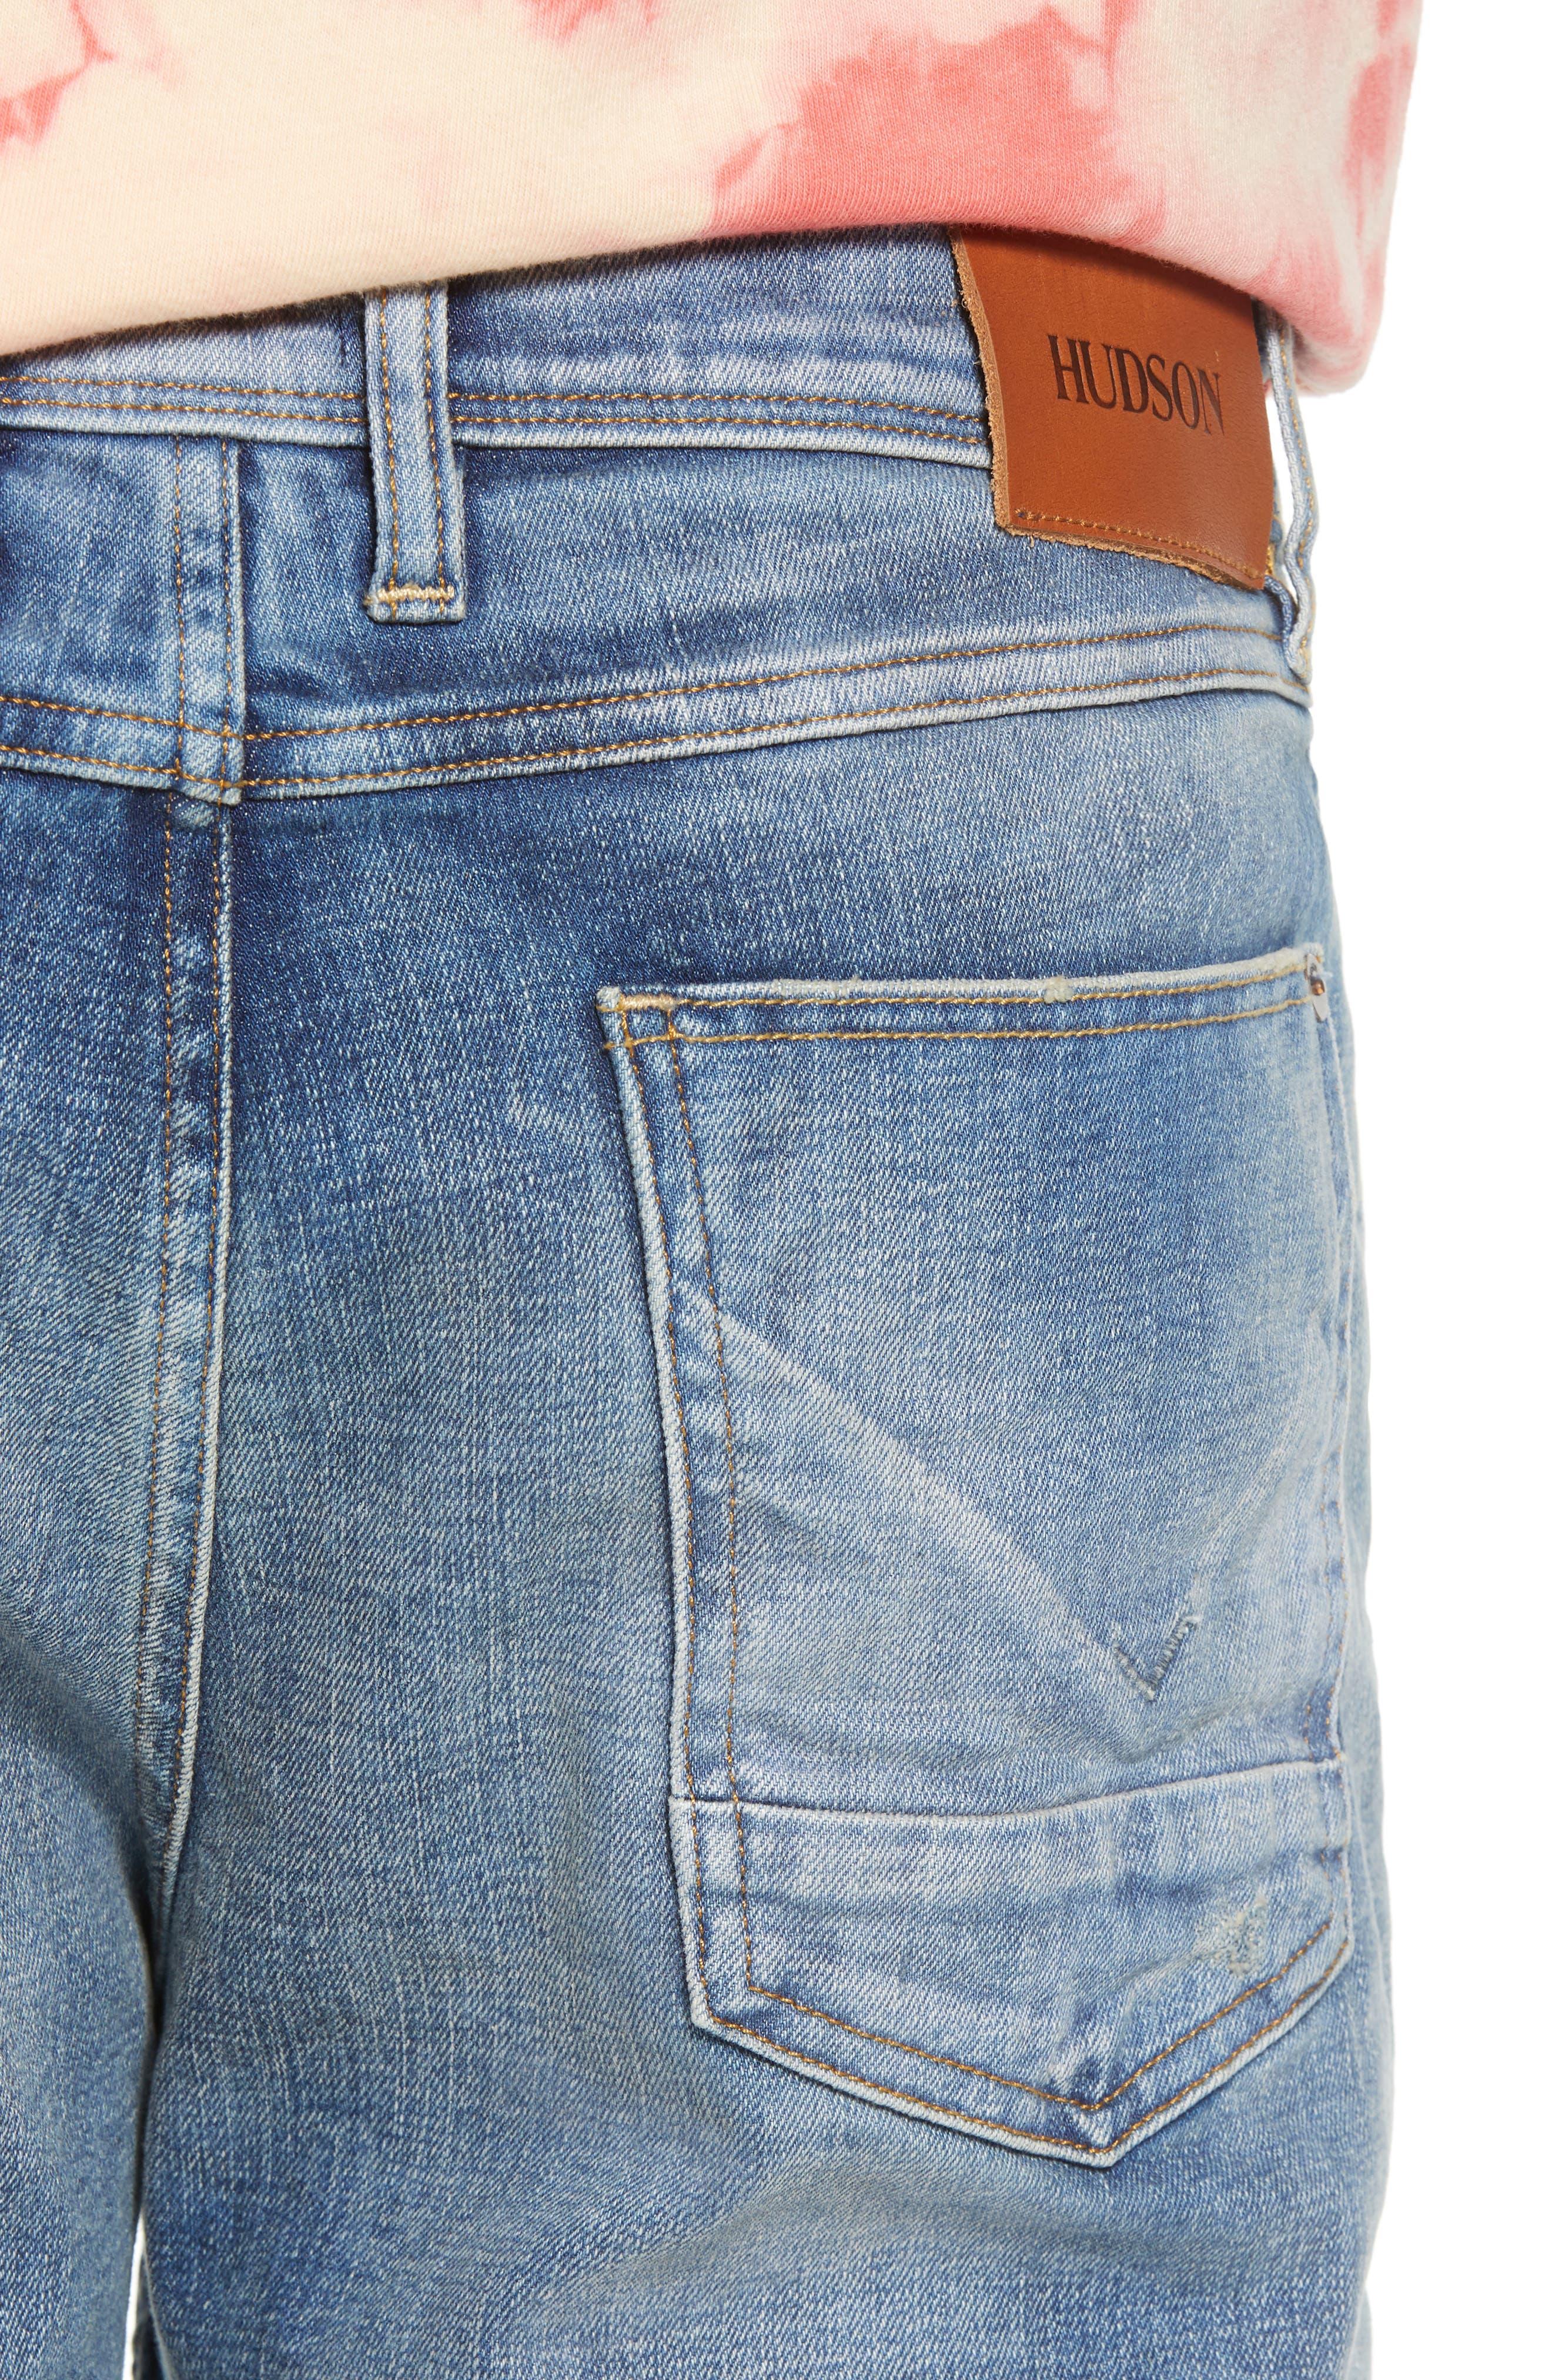 Sartor Slouchy Skinny Fit Jeans,                             Alternate thumbnail 4, color,                             Los Feliz